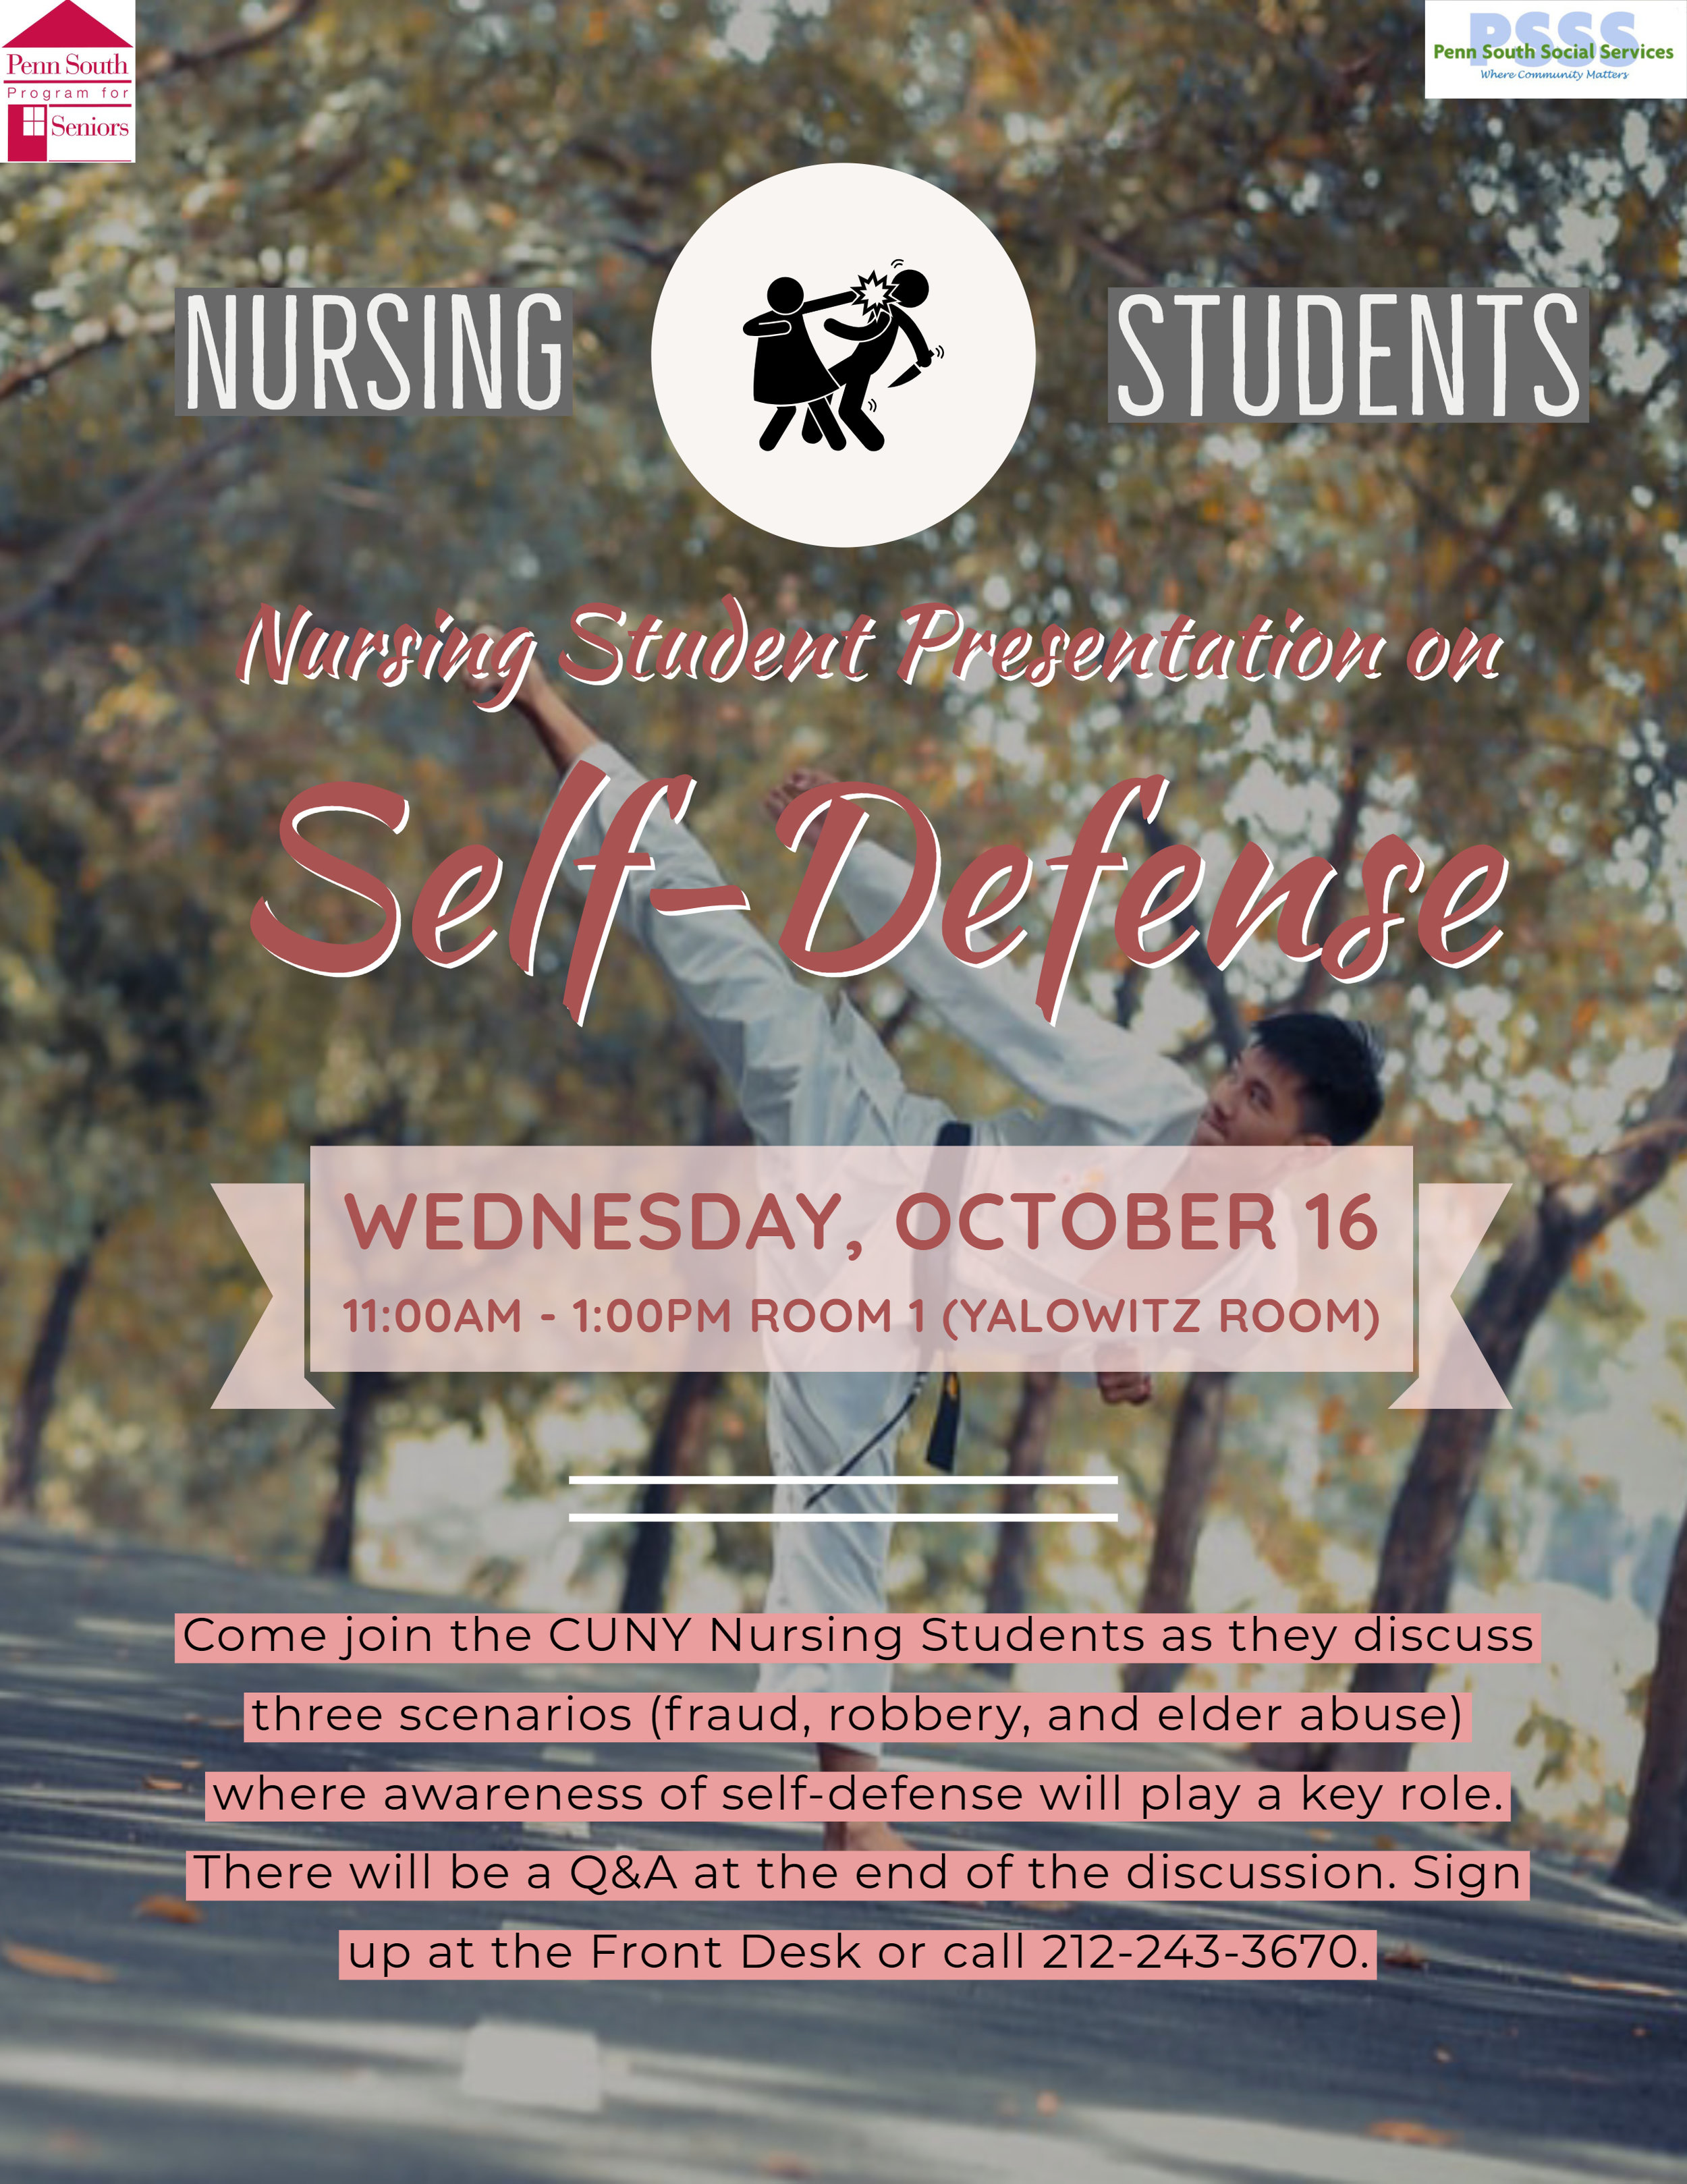 Nursing Student Self-Defense.jpg